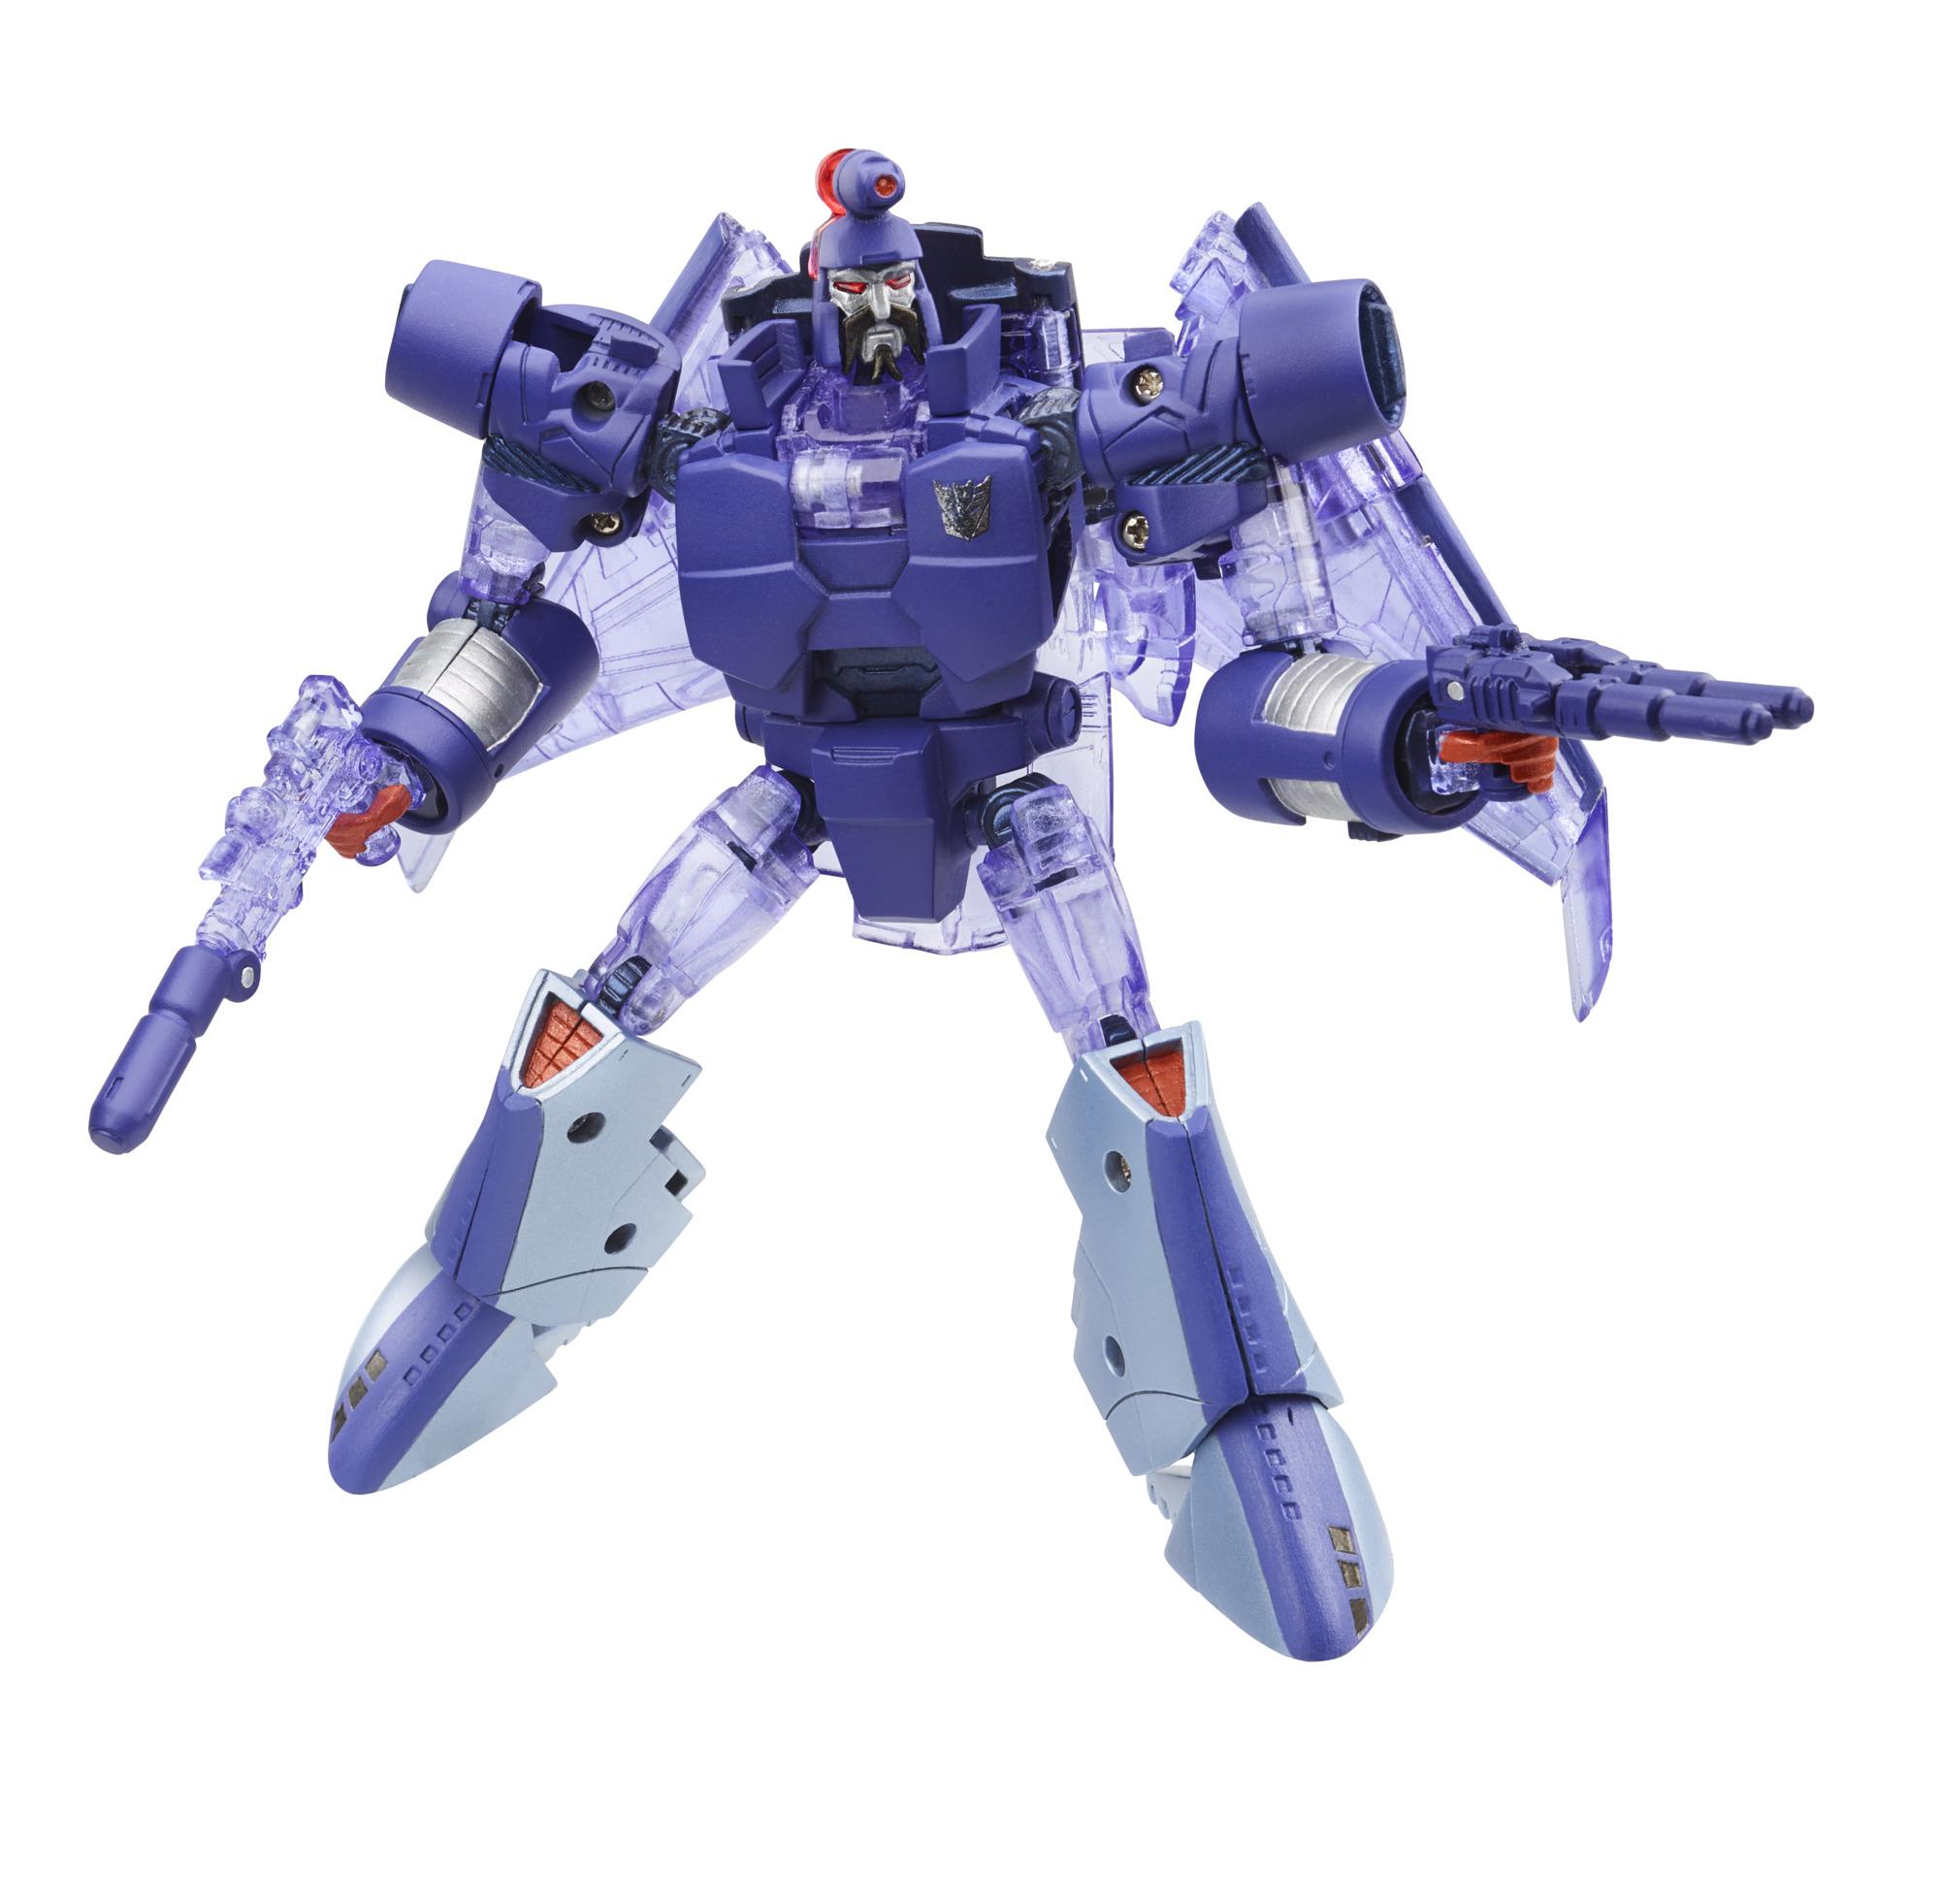 Scourge Bot Mode